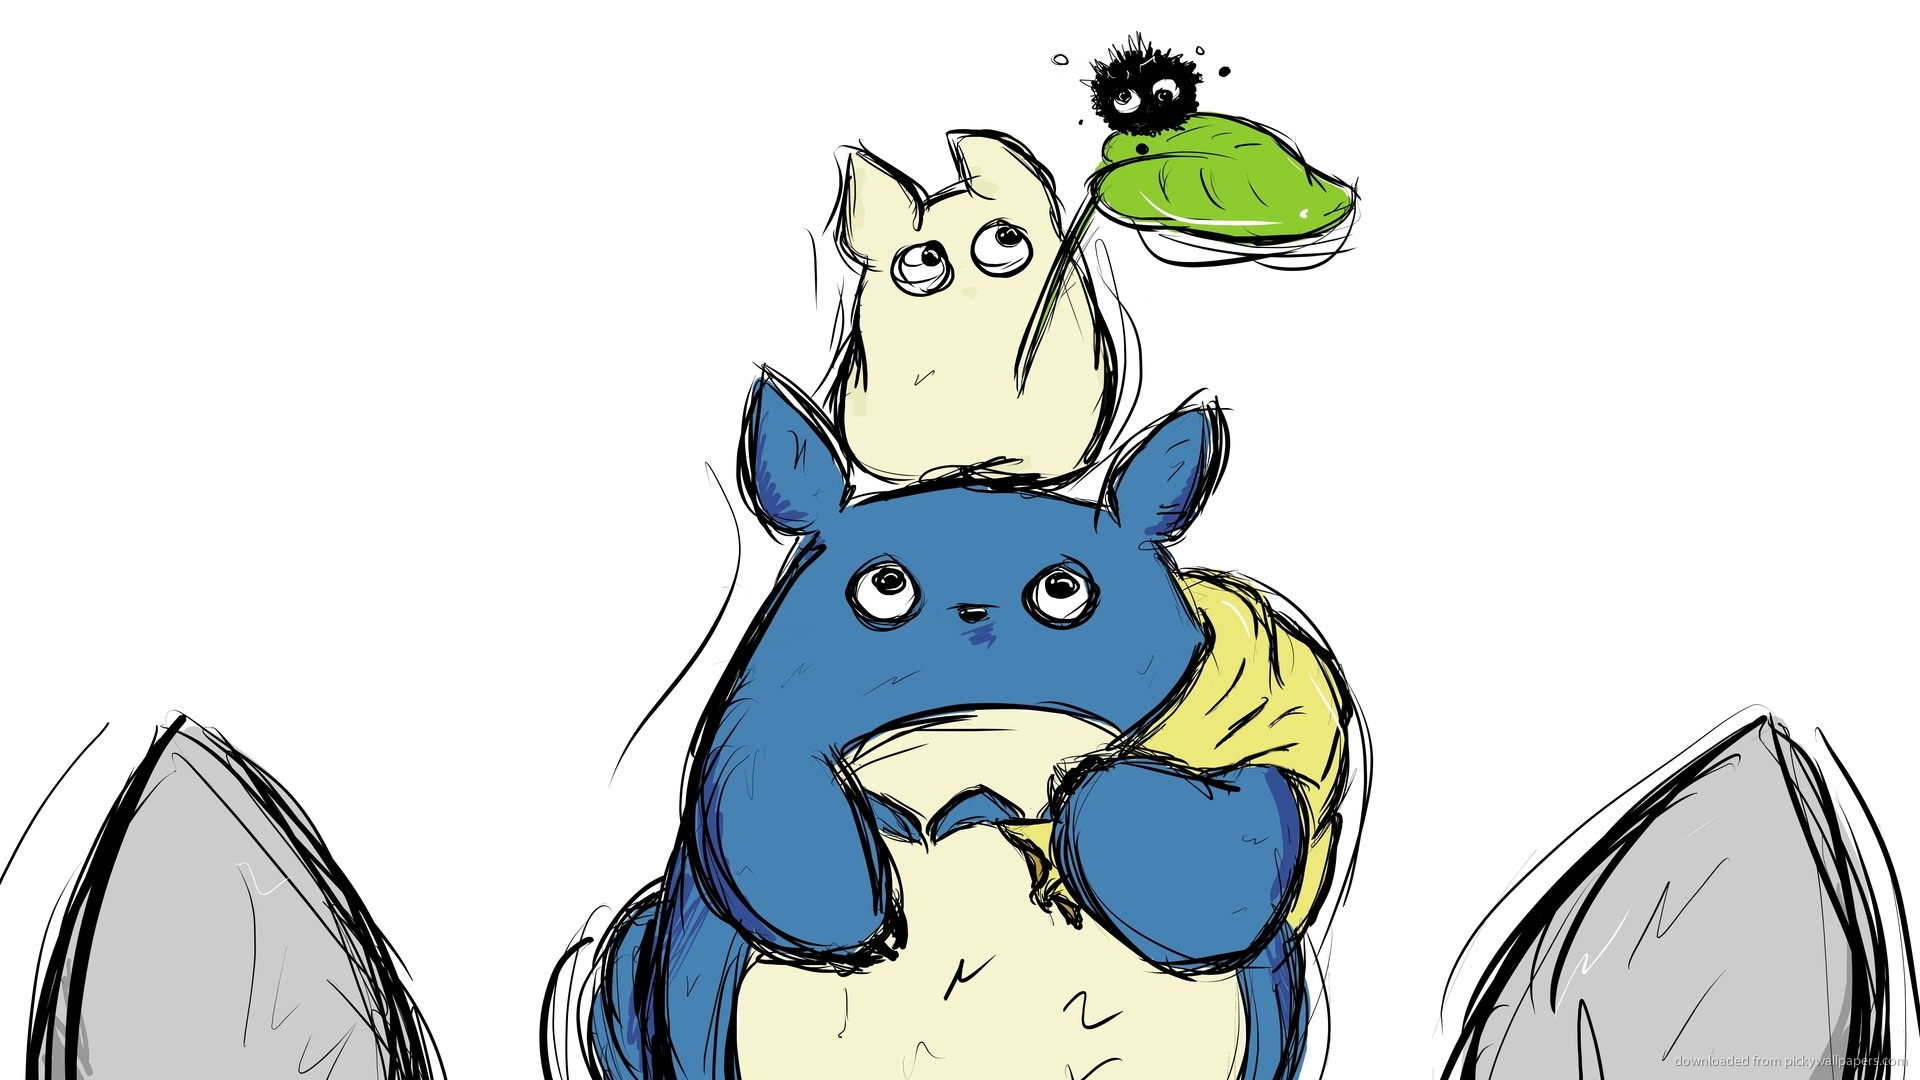 Totoro Wallpaper HD (62+ images)